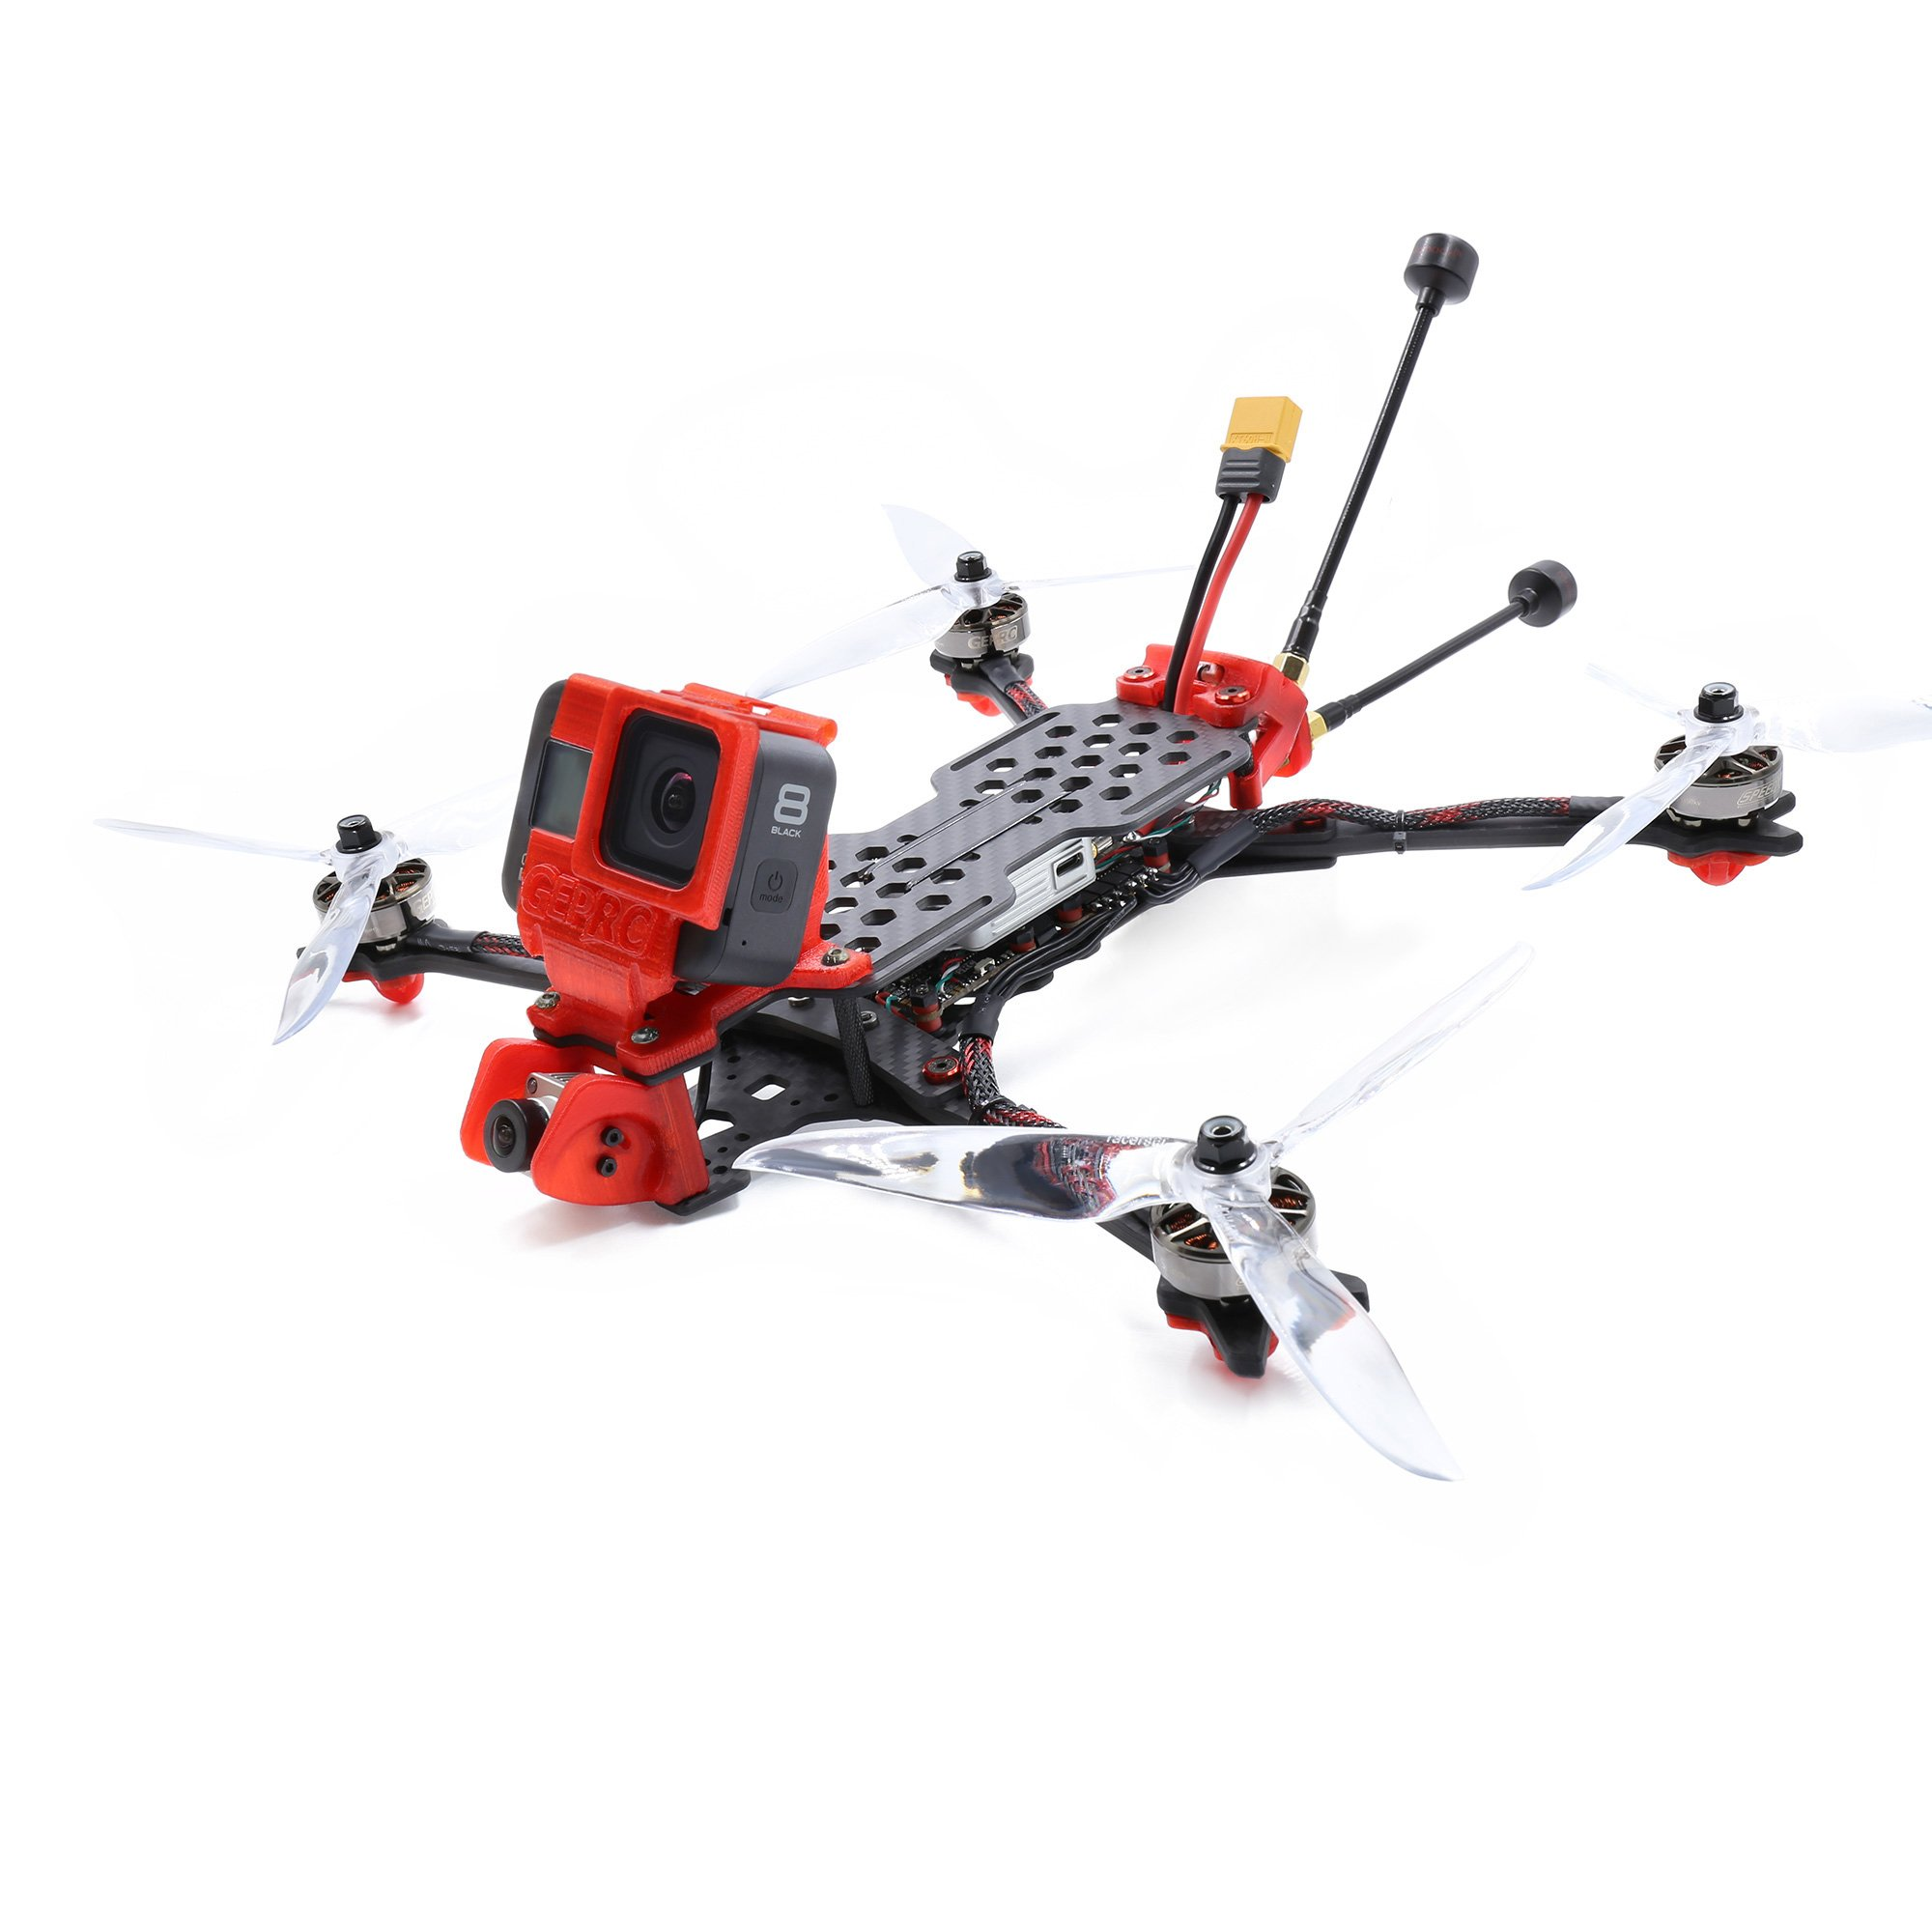 GEPRC Crocodile7 HD زائد لايت فترة F722 HD BLHELI32 50A FPV الهواء وحدة CADDX فيستا HD GR2306.5 1350KV 6S LR7 FPV طويلة المدى Drone